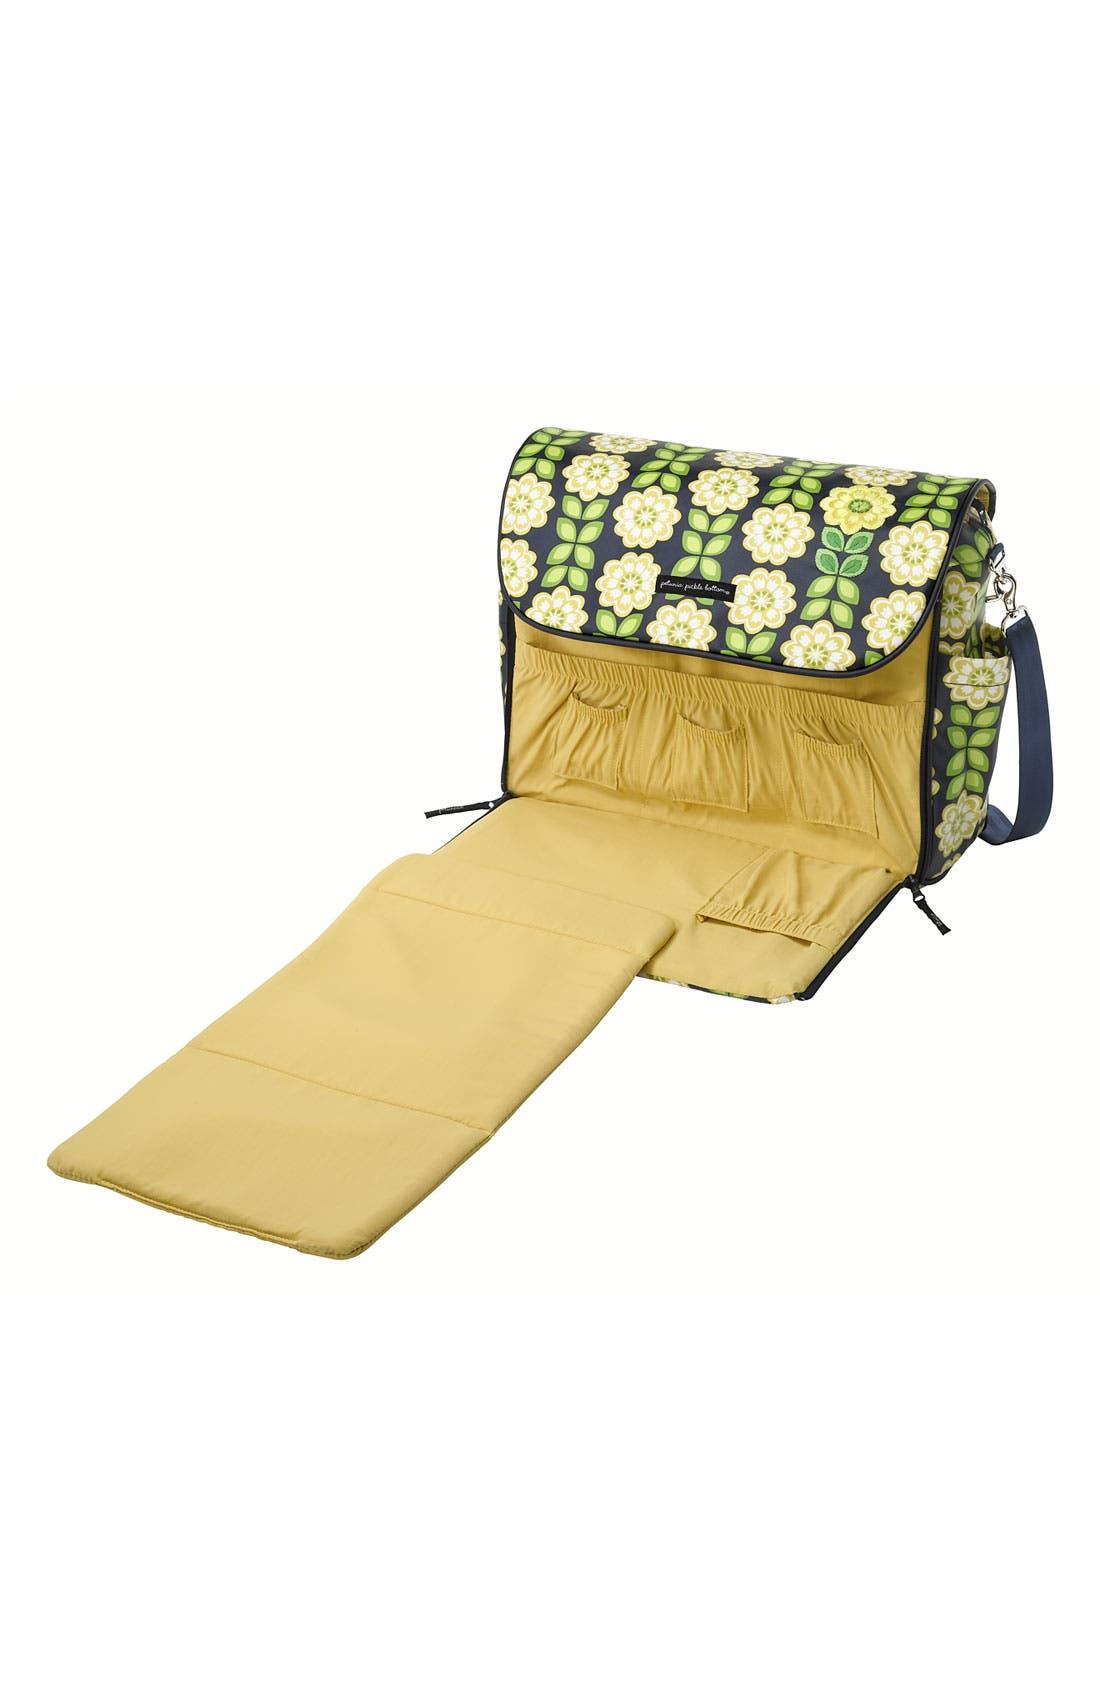 Alternate Image 3  - Petunia Pickle Bottom Glazed 'Abundance Boxy Backpack' Diaper Bag